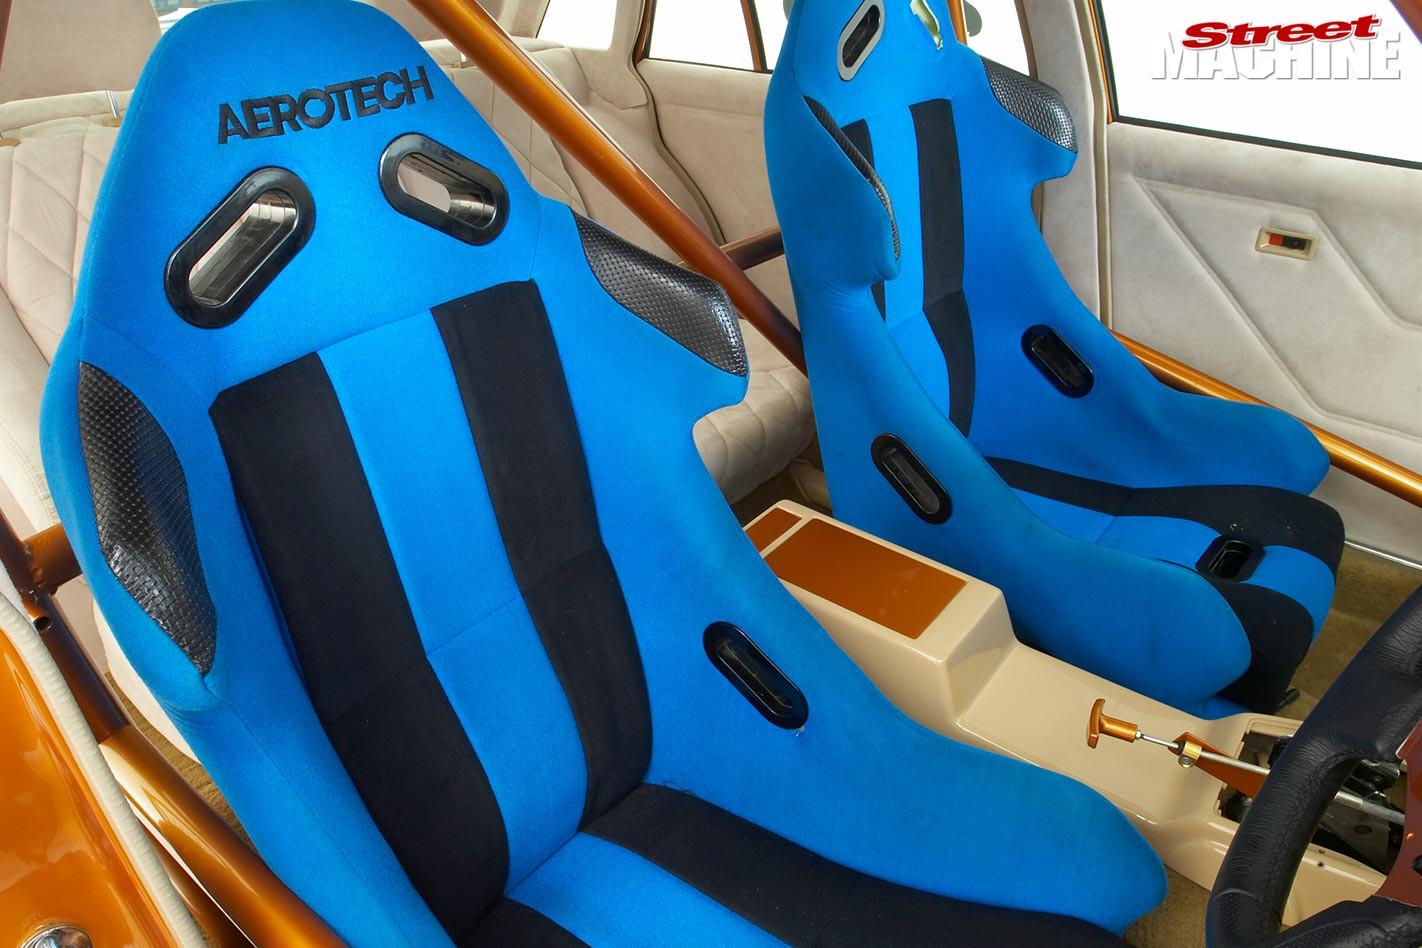 Holden VL Commodore seats